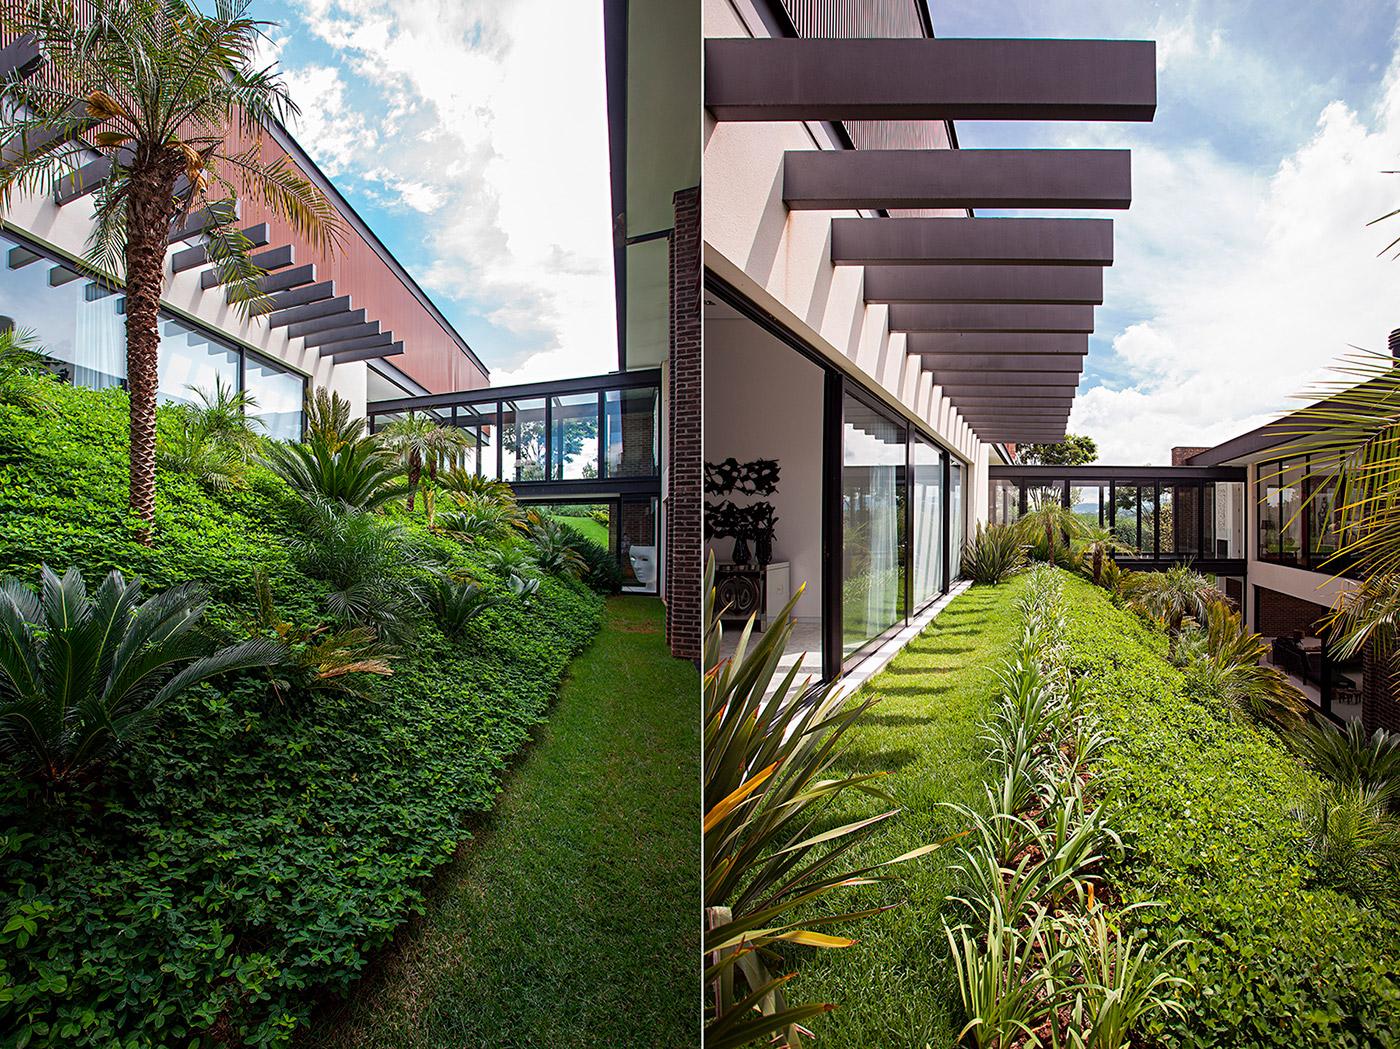 jardim paisagismo roberto riscala tropical parque plantas